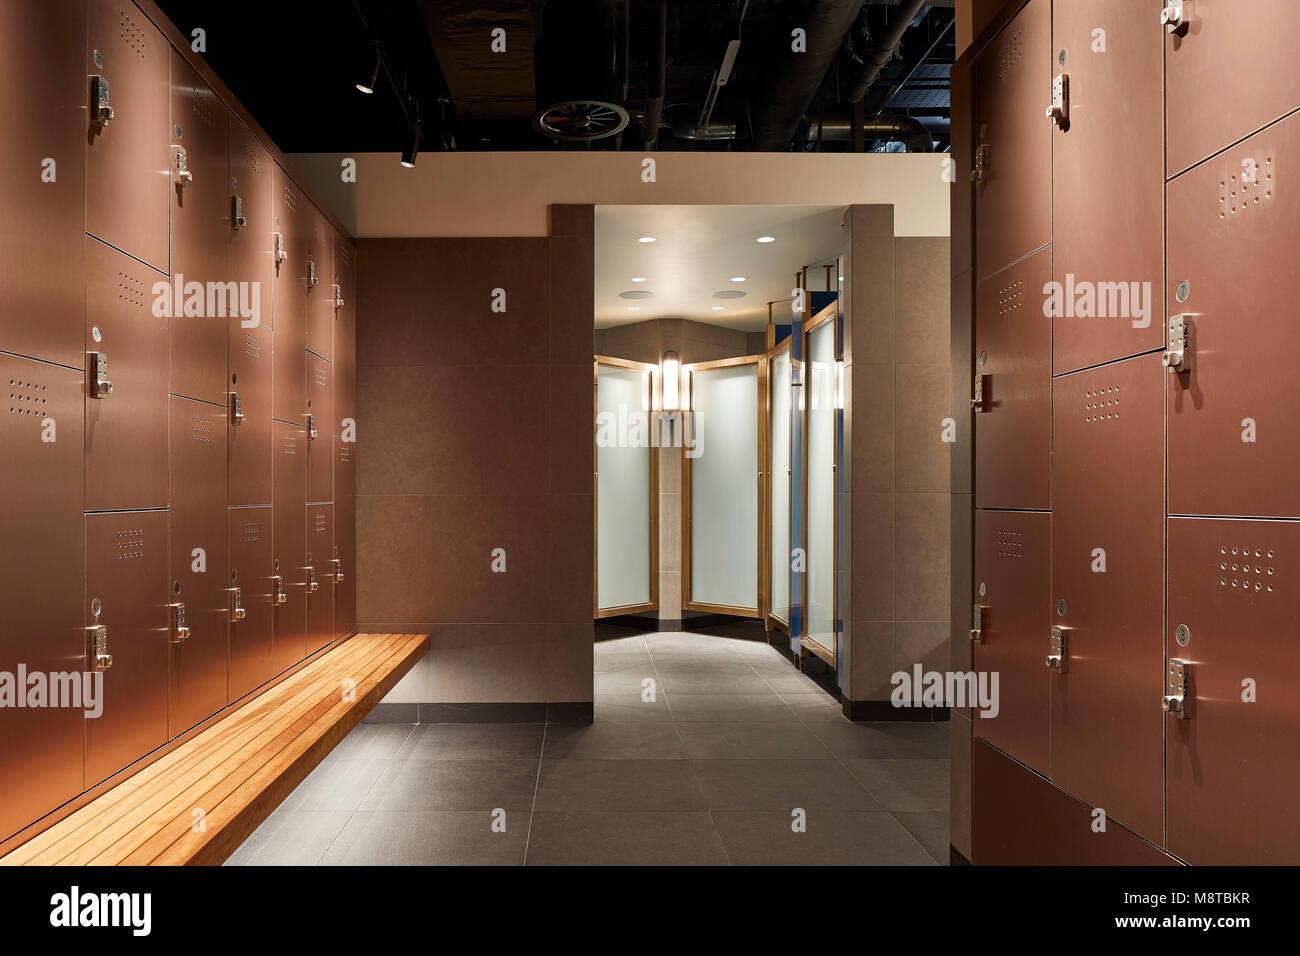 Changing room with lockers. KXU London, London, United Kingdom. Architect: Stiff + Trevillion Architects, 2017. - Stock Image